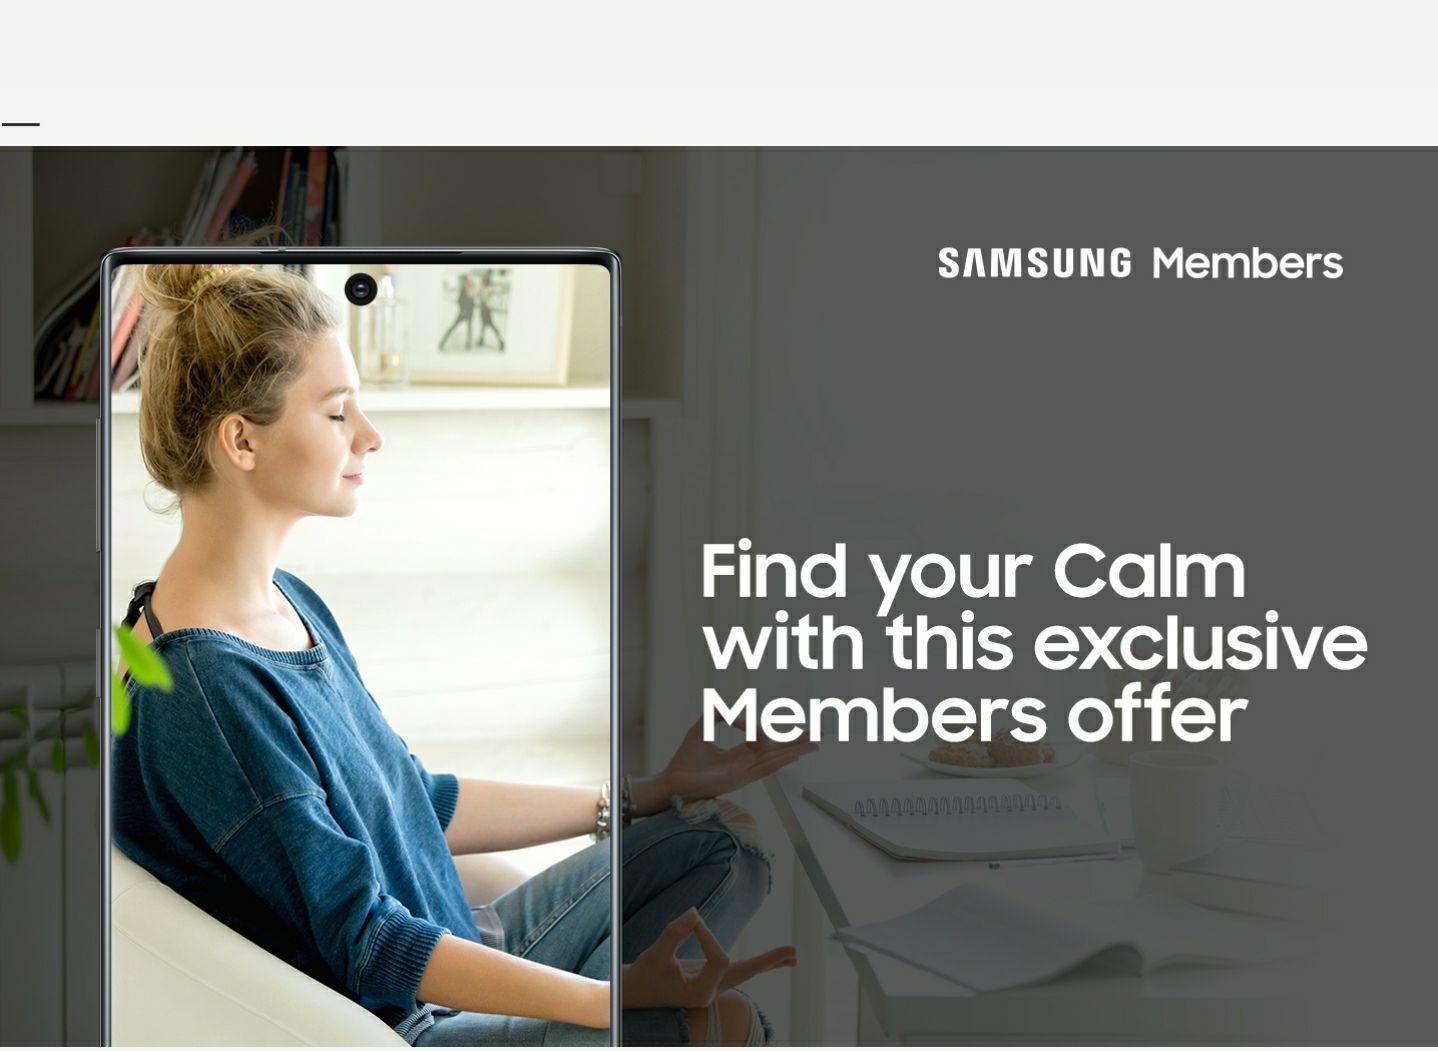 6 Months Free Calm Premium for Samsung Members via Samsung Health